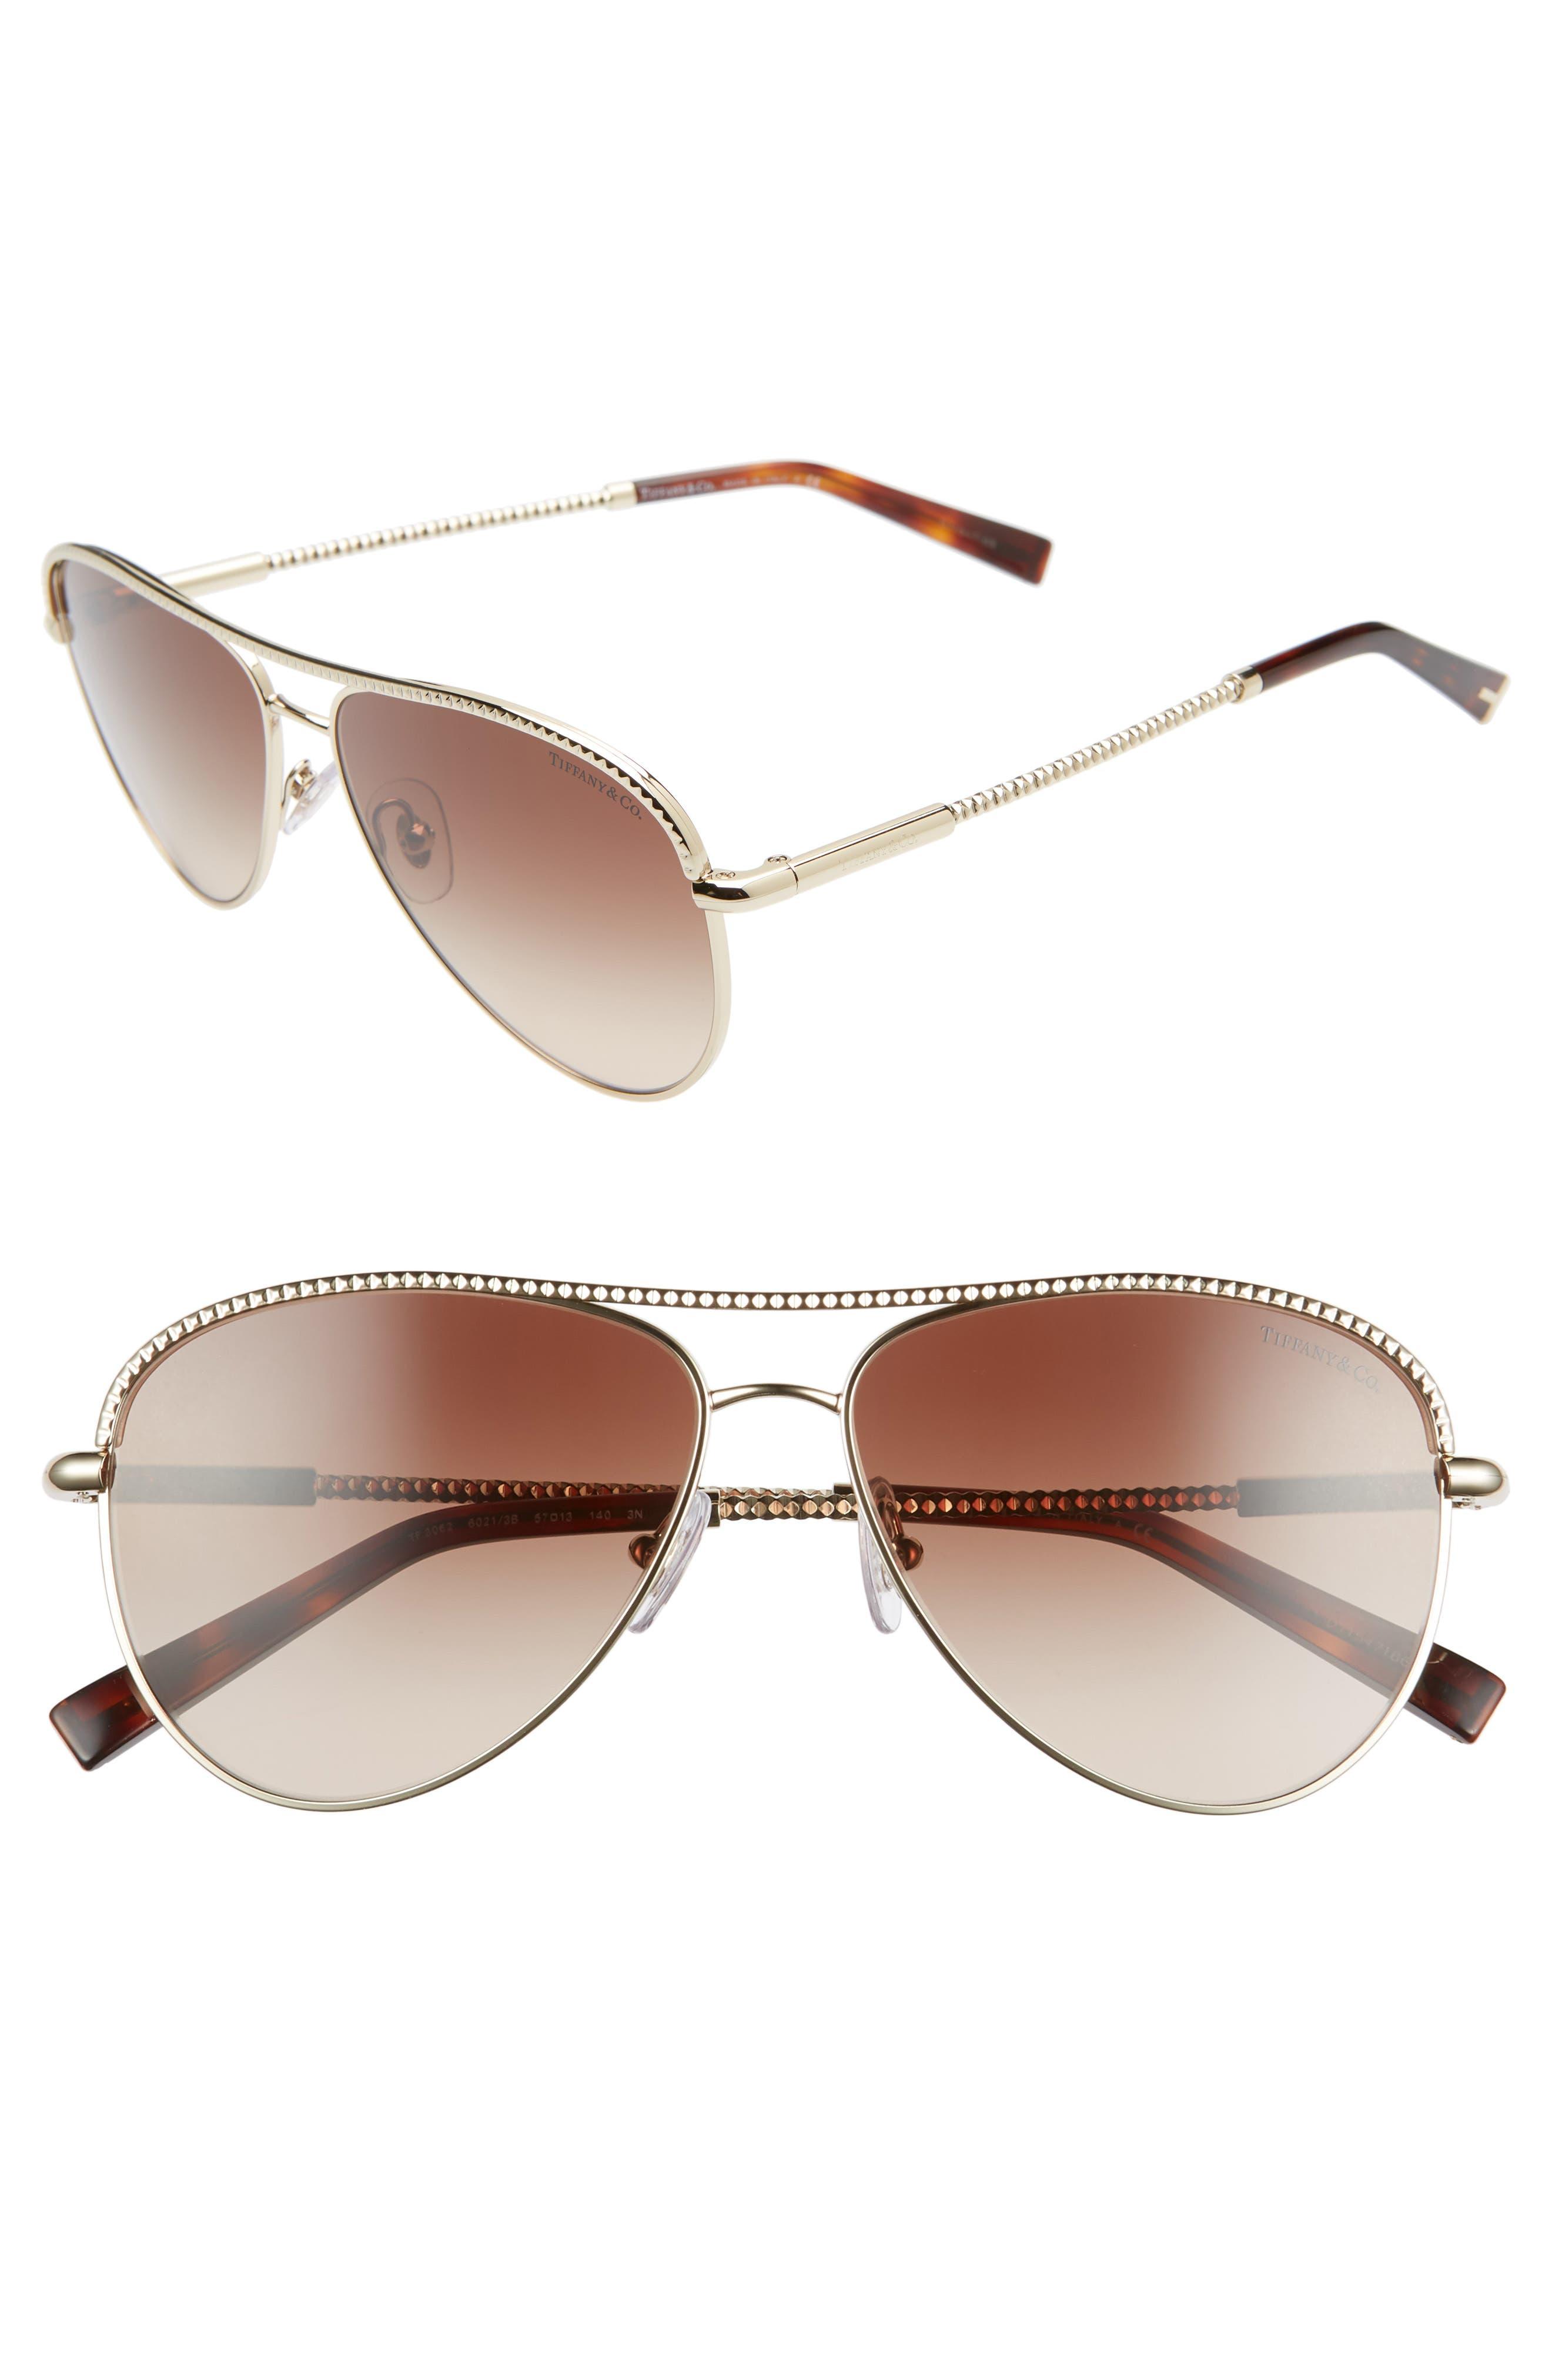 Women s Tiffany   Co 57Mm Aviator Sunglasses - Pale Gold Gradient 8175018d7a